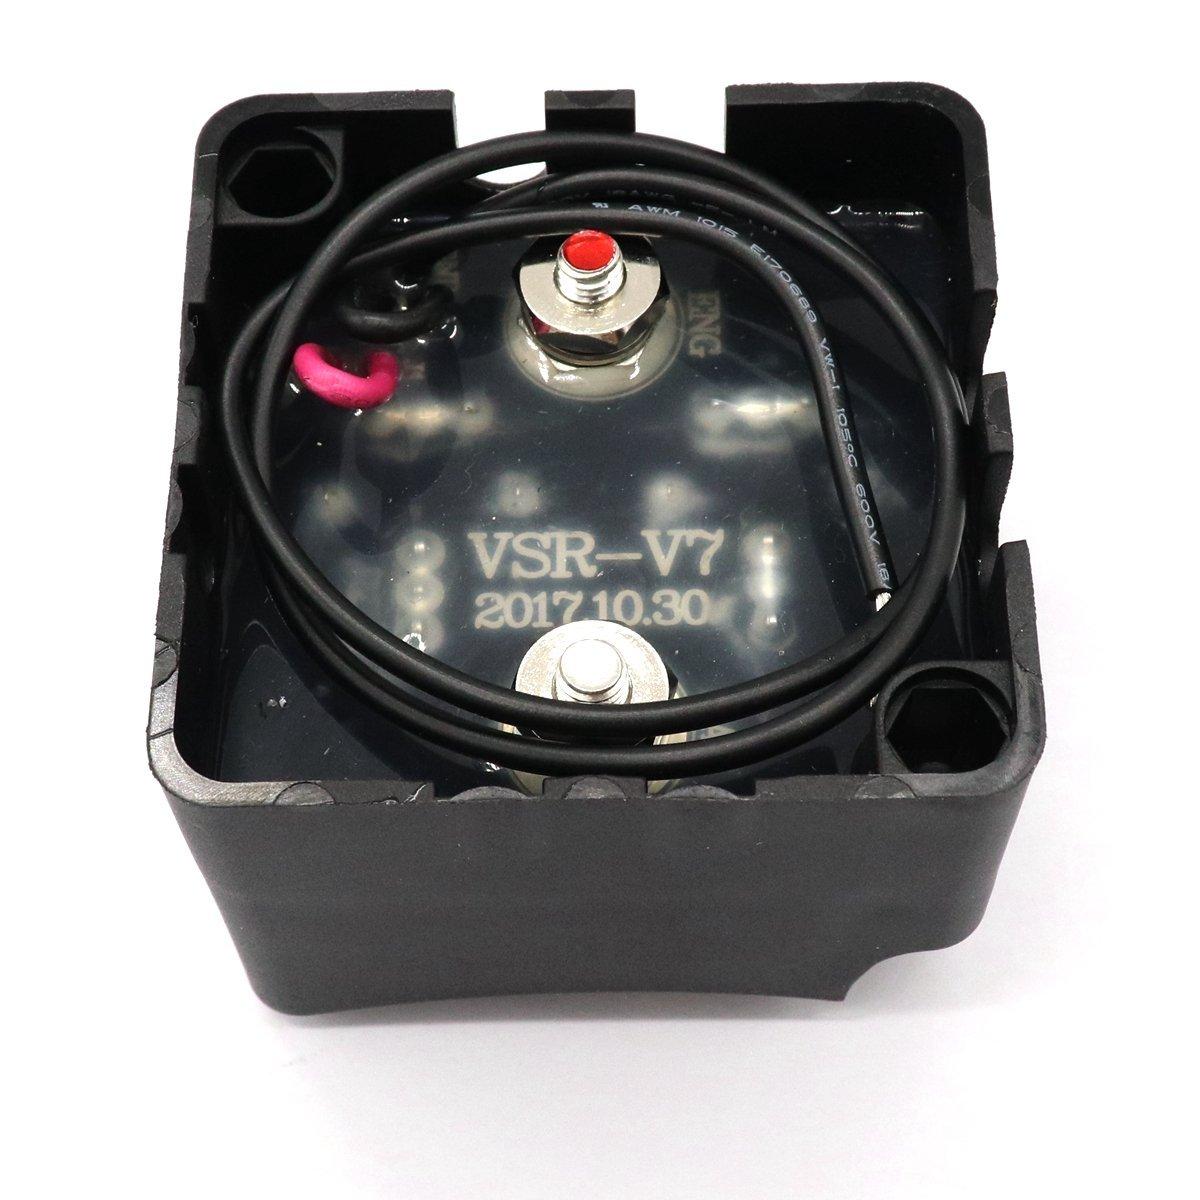 Gloaso Digital Spannung empfindliches Relais 12V VSR 24V DC 140 Ampere